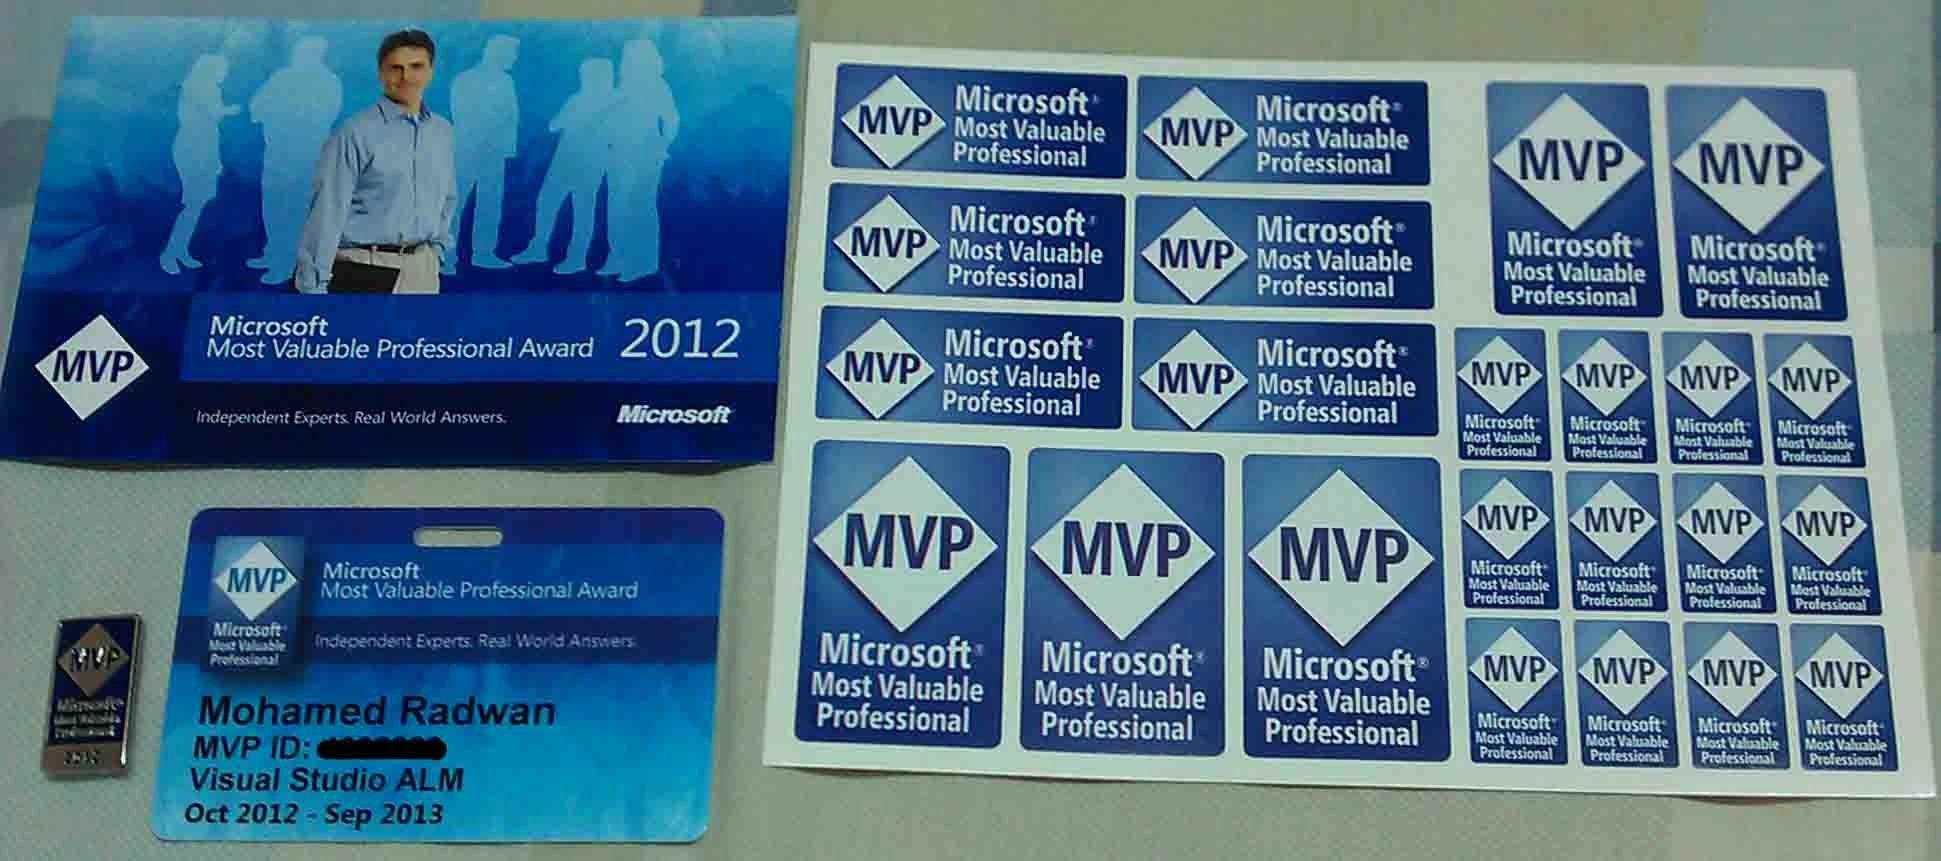 Mvp Visuals Design Scholarship Luxury I Am now A Visual Studio Alm Mvp